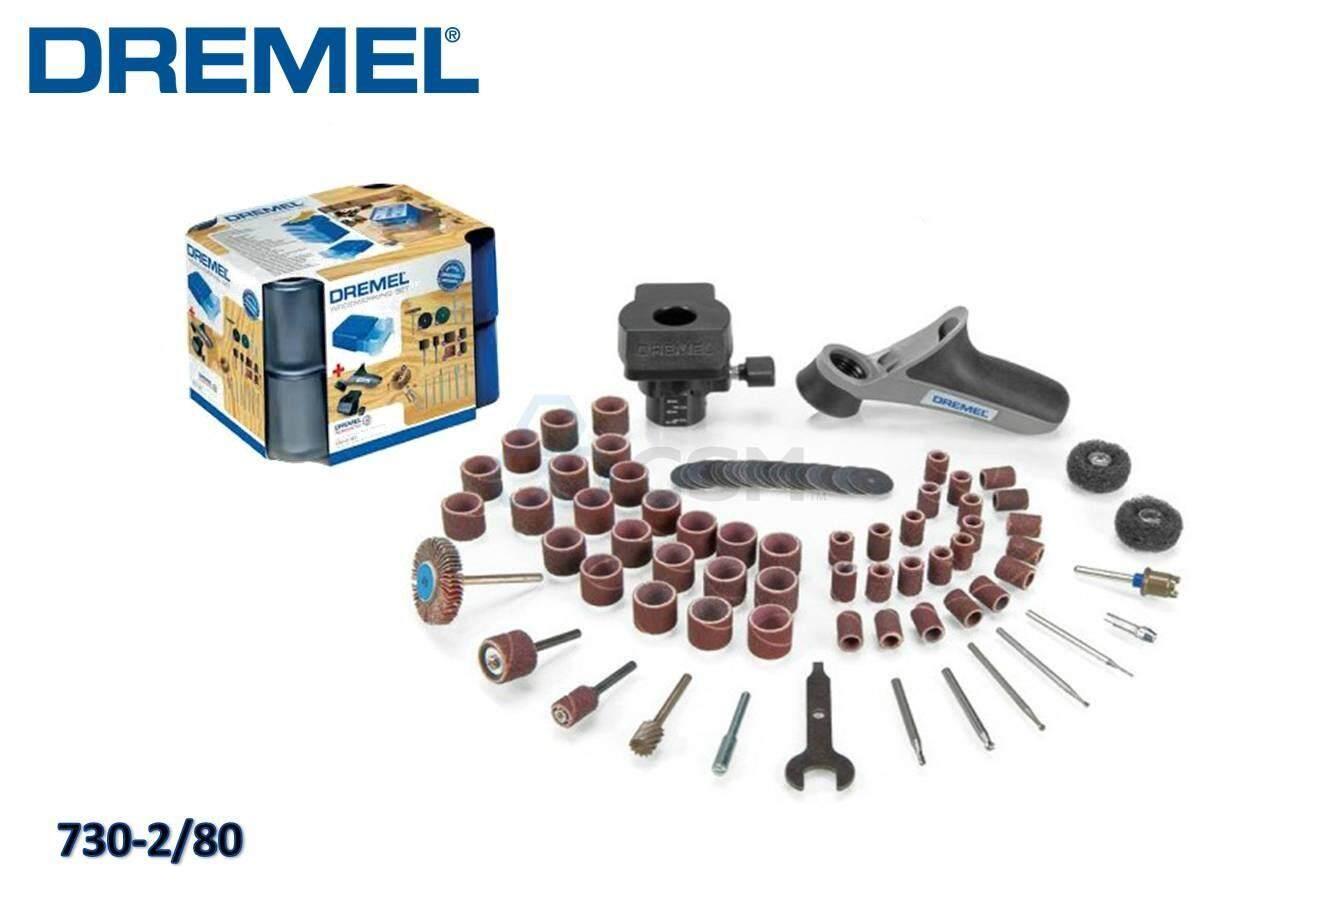 Dremel 730-2/80 Wood Working Set 26150730JA